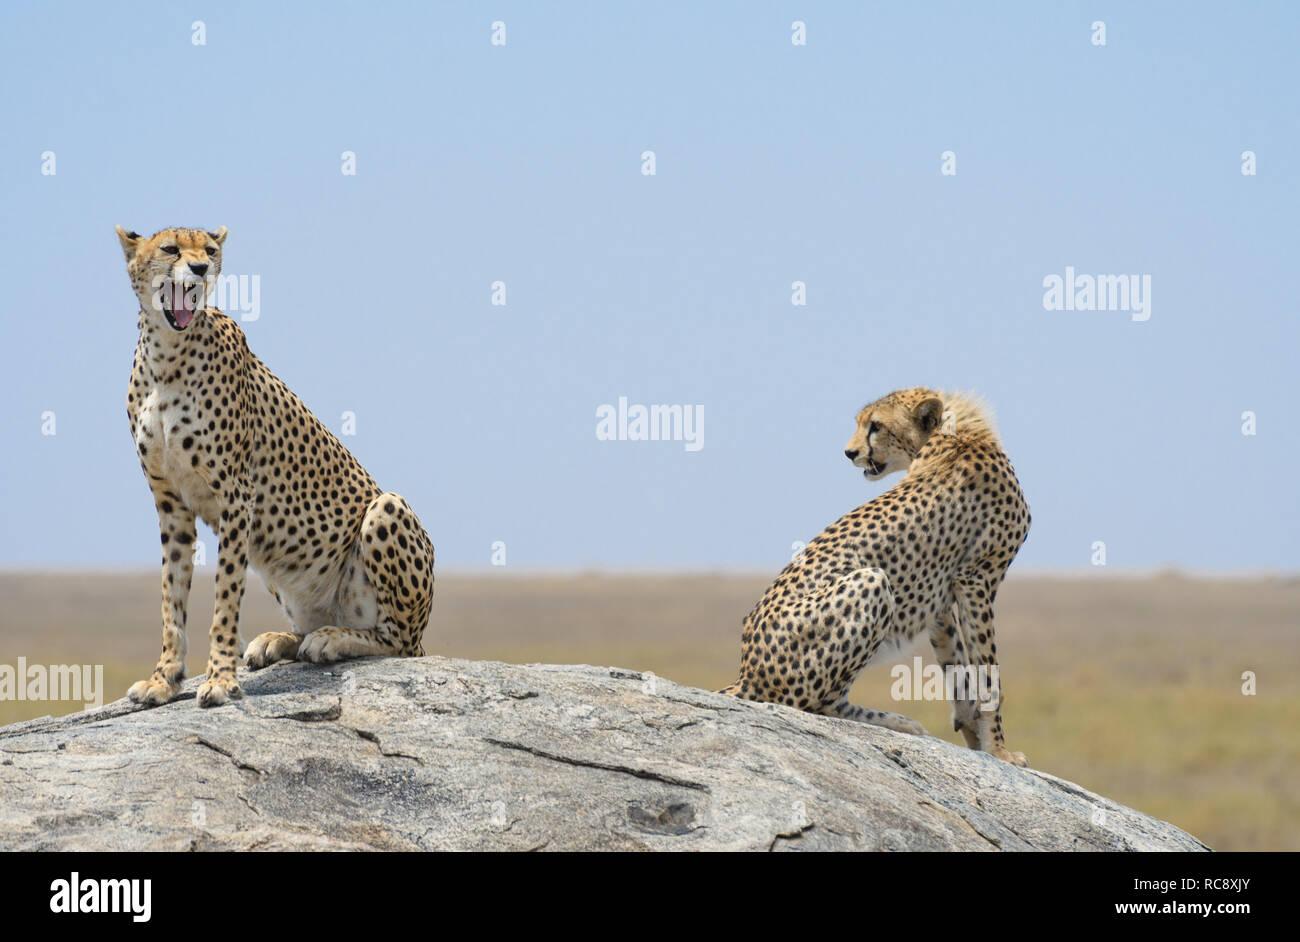 two cheetahs on rock - Stock Image